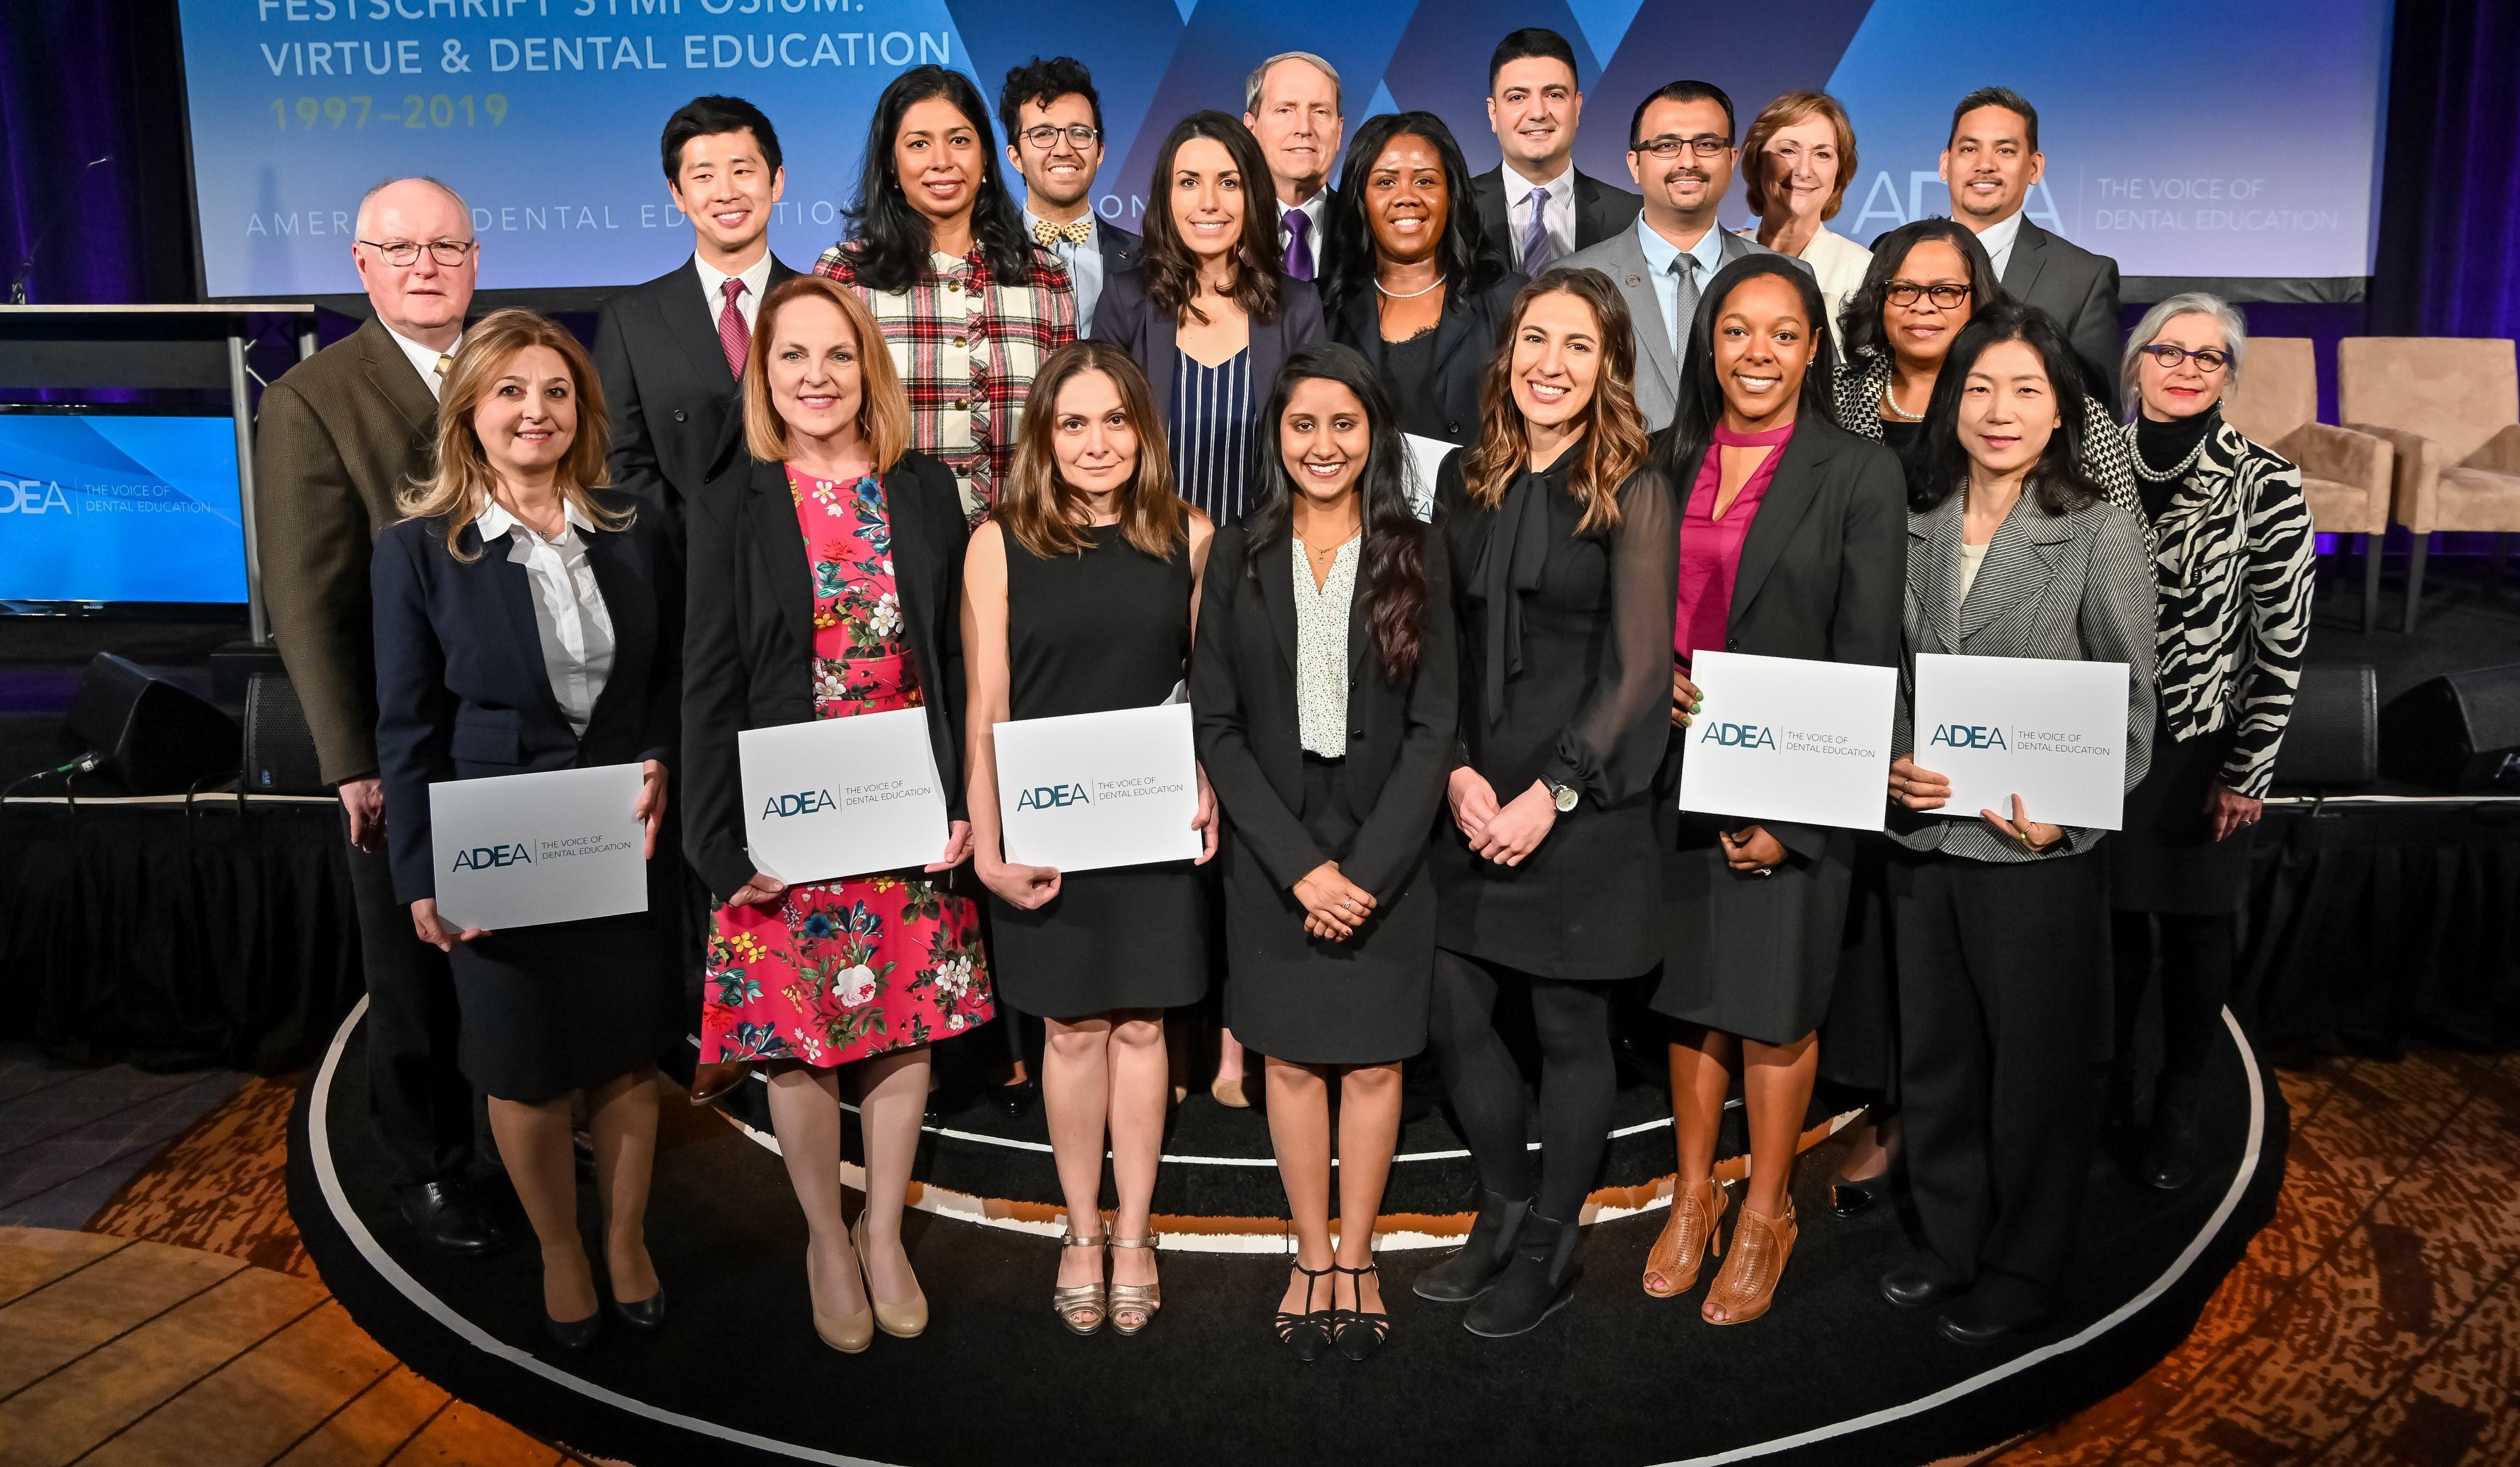 ADEA Scholarships, Awards and Fellowships